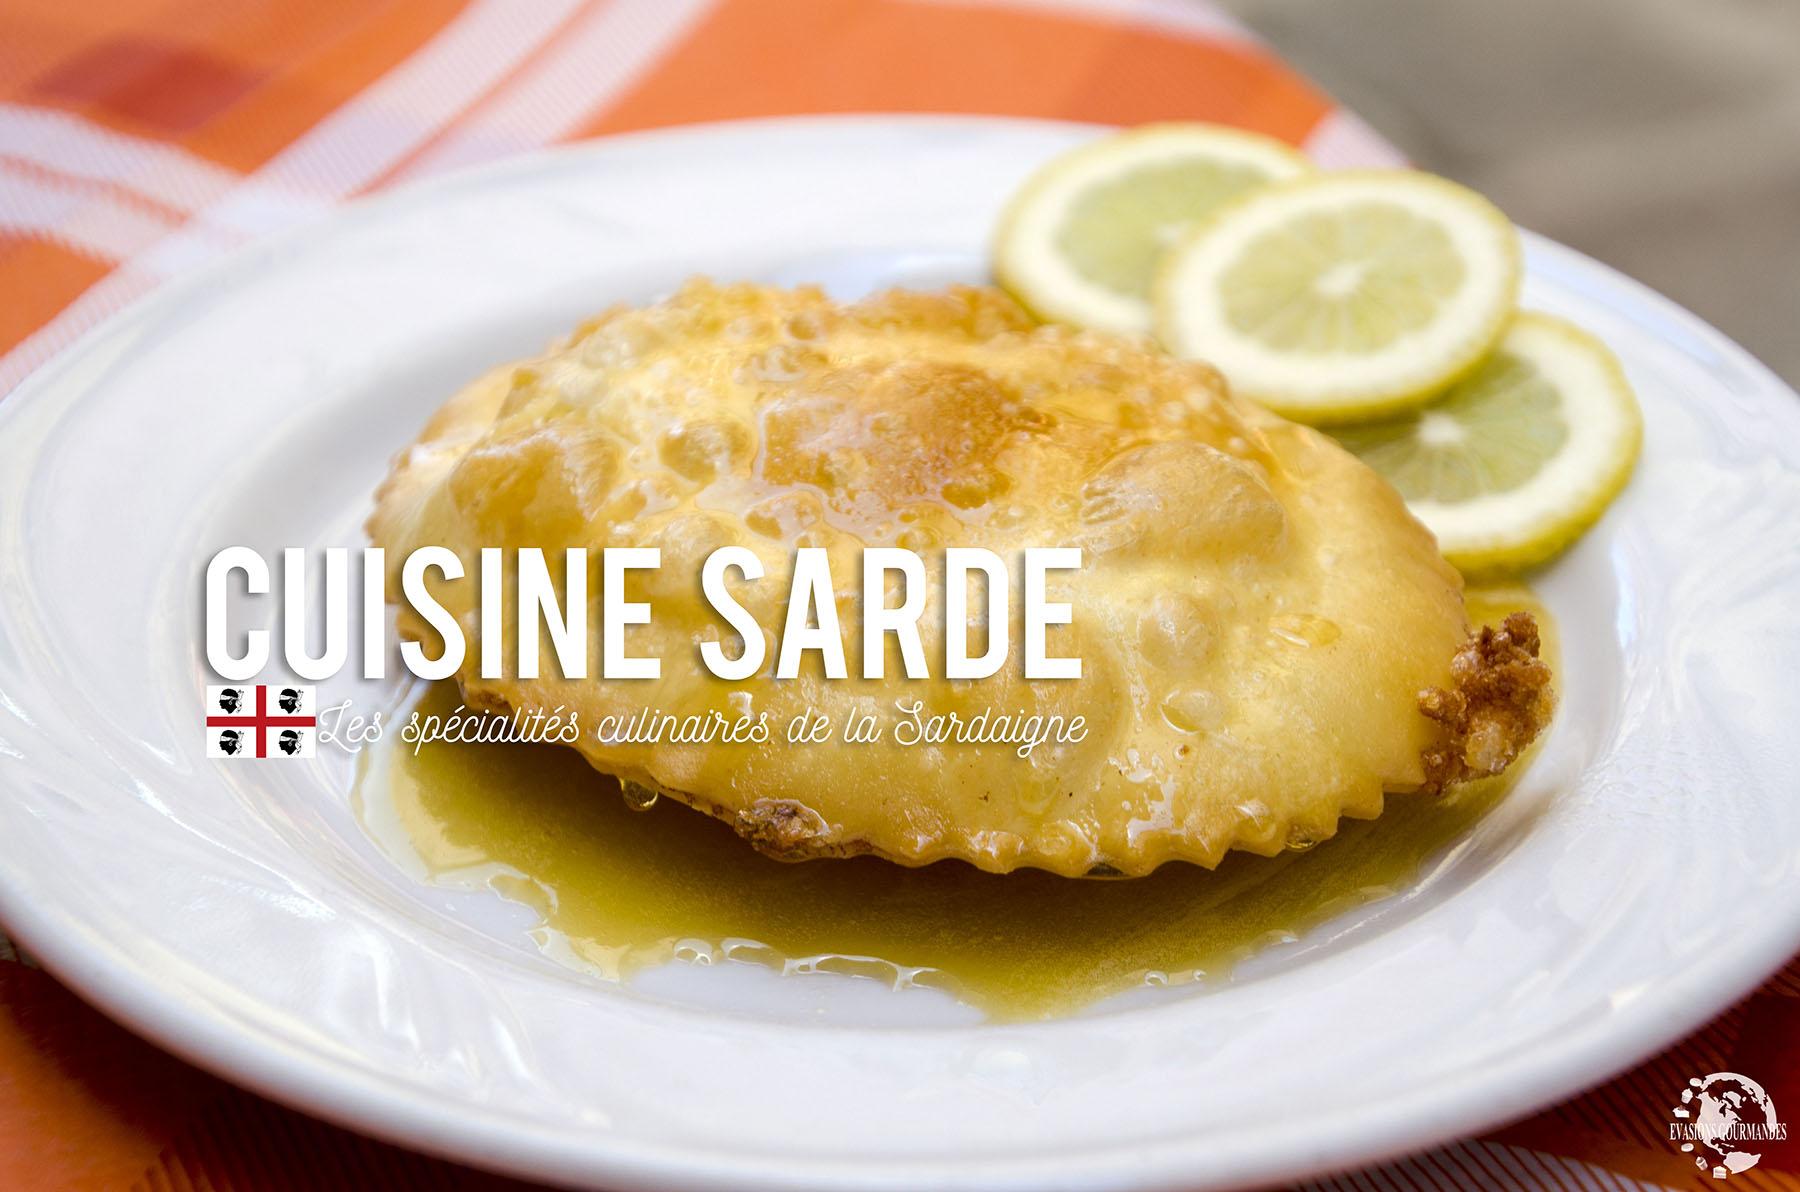 Cuisine sarde